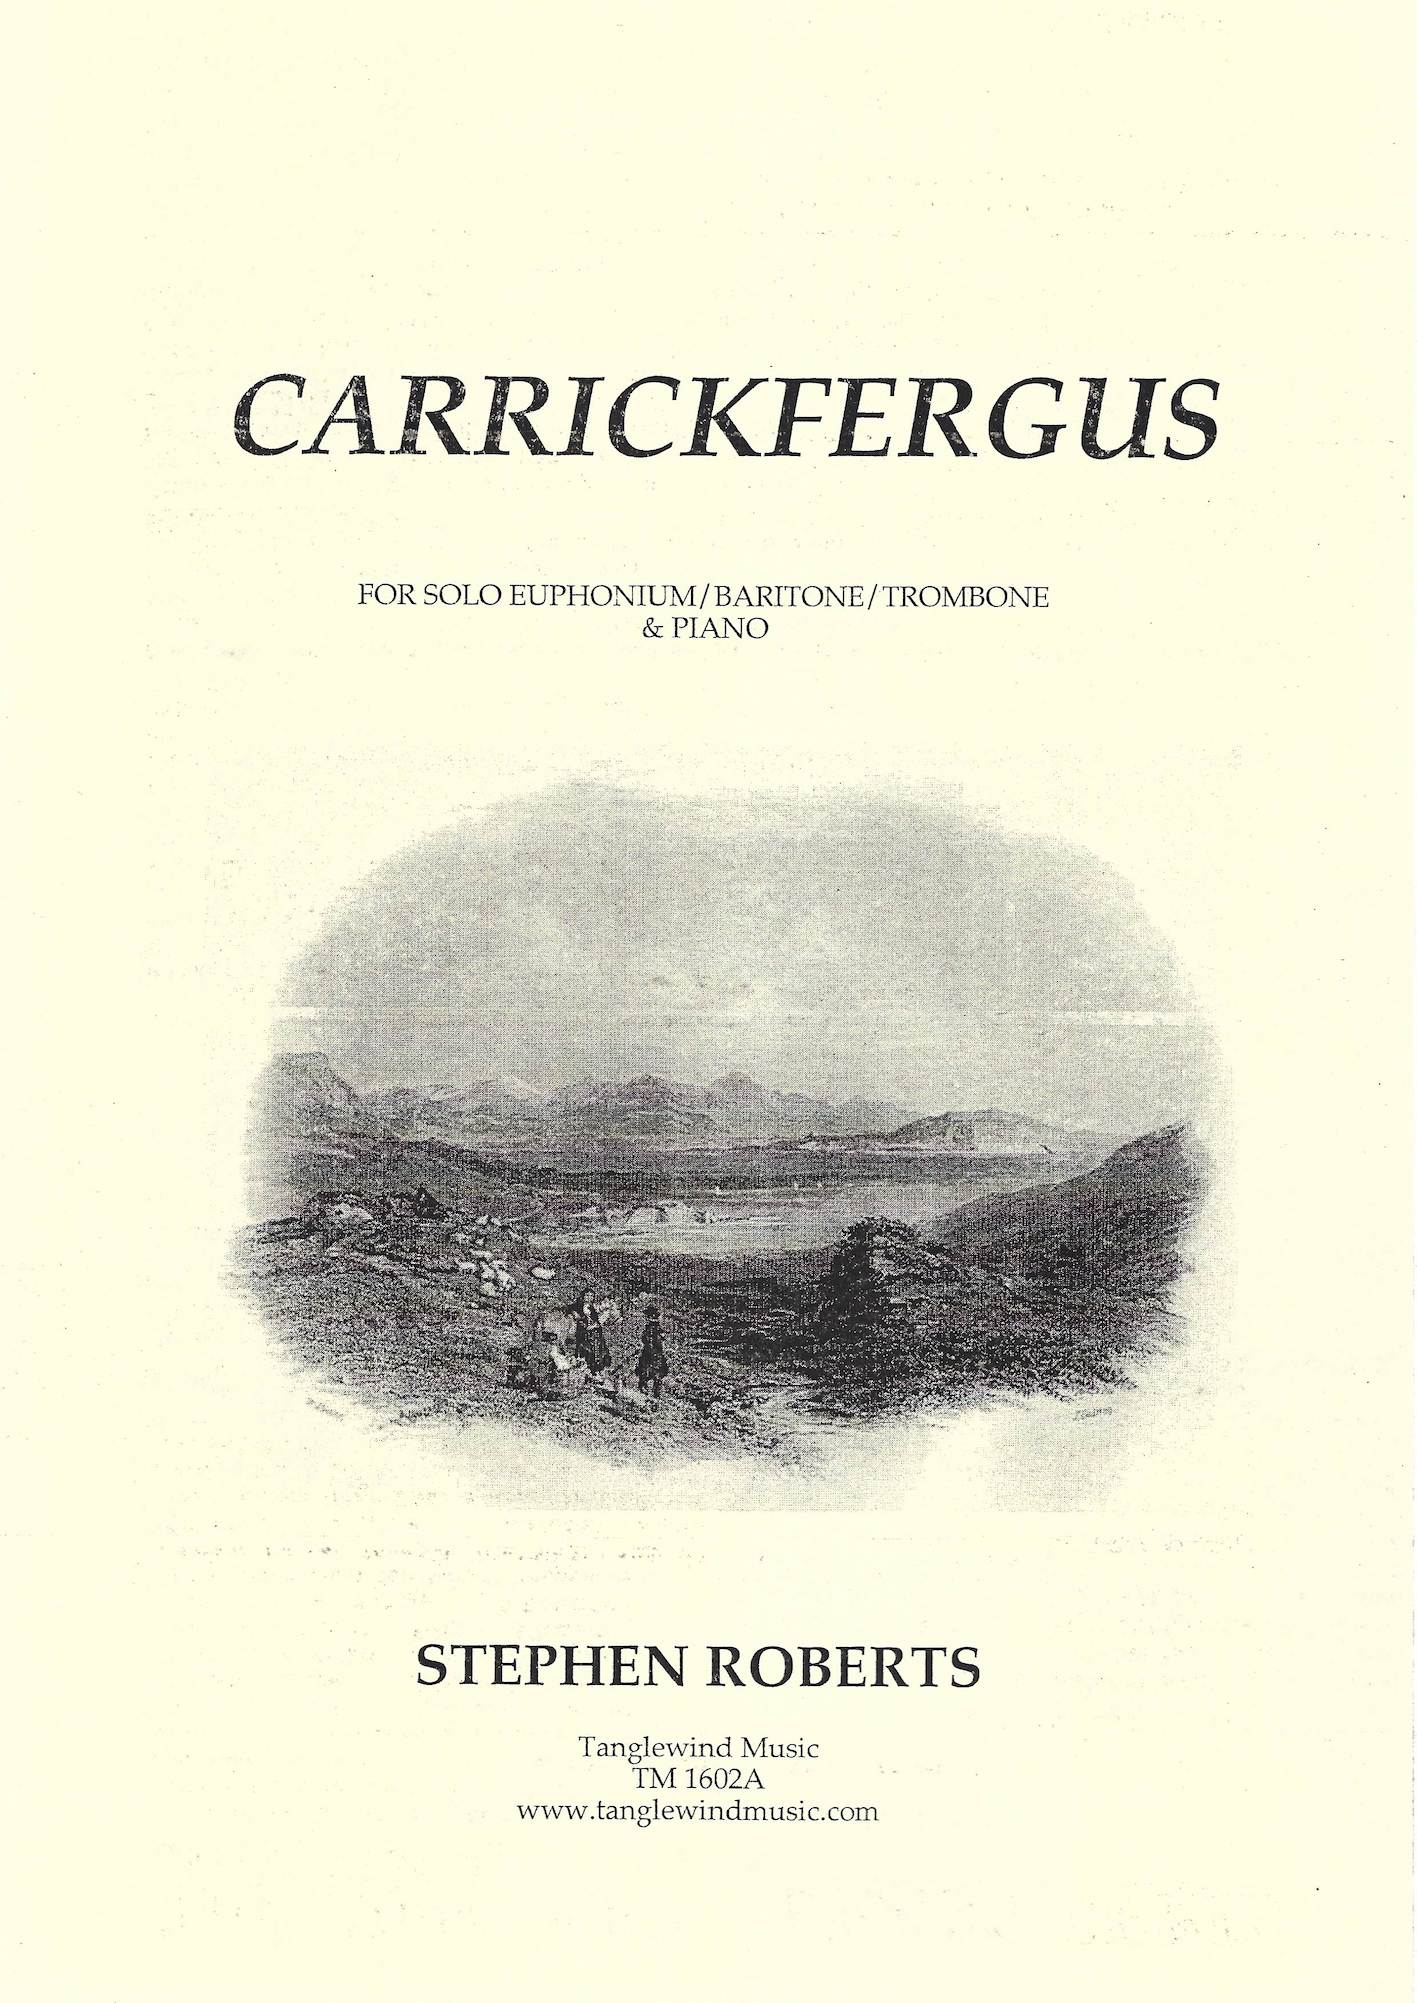 Carrickfergus - Trad. Irish Air Arr. Stephen Roberts - Euphonium (or baritone or trombone) with piano accompaniment